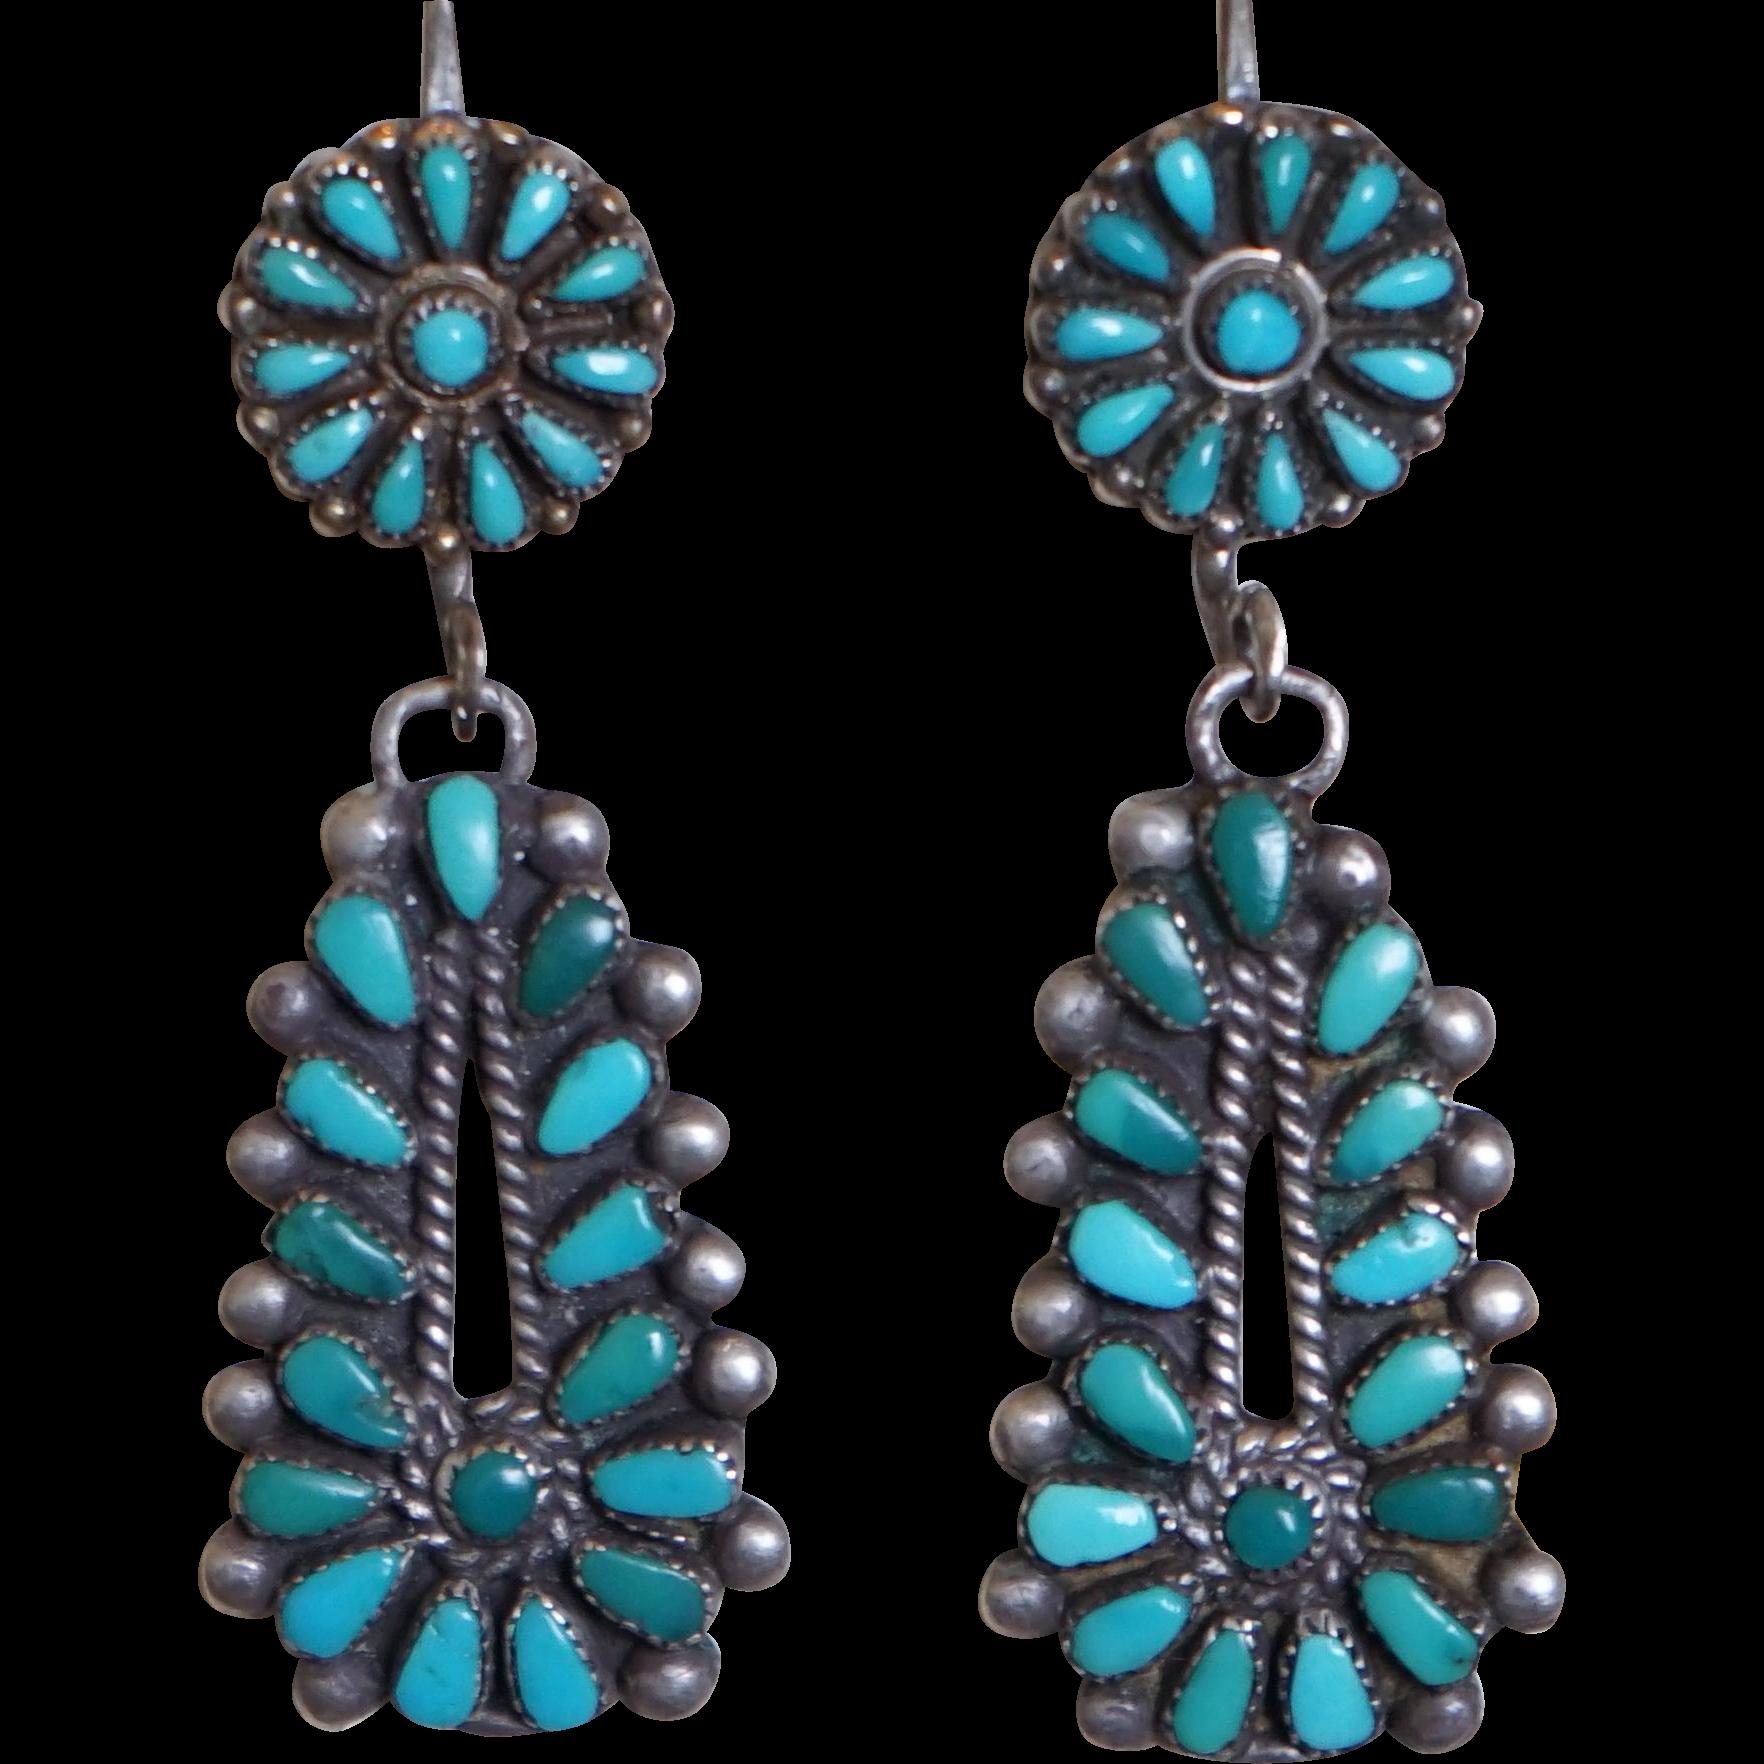 Vintage Turquoise Boho Earrings Antique Jewelry Long Dangle Earring necklace Set